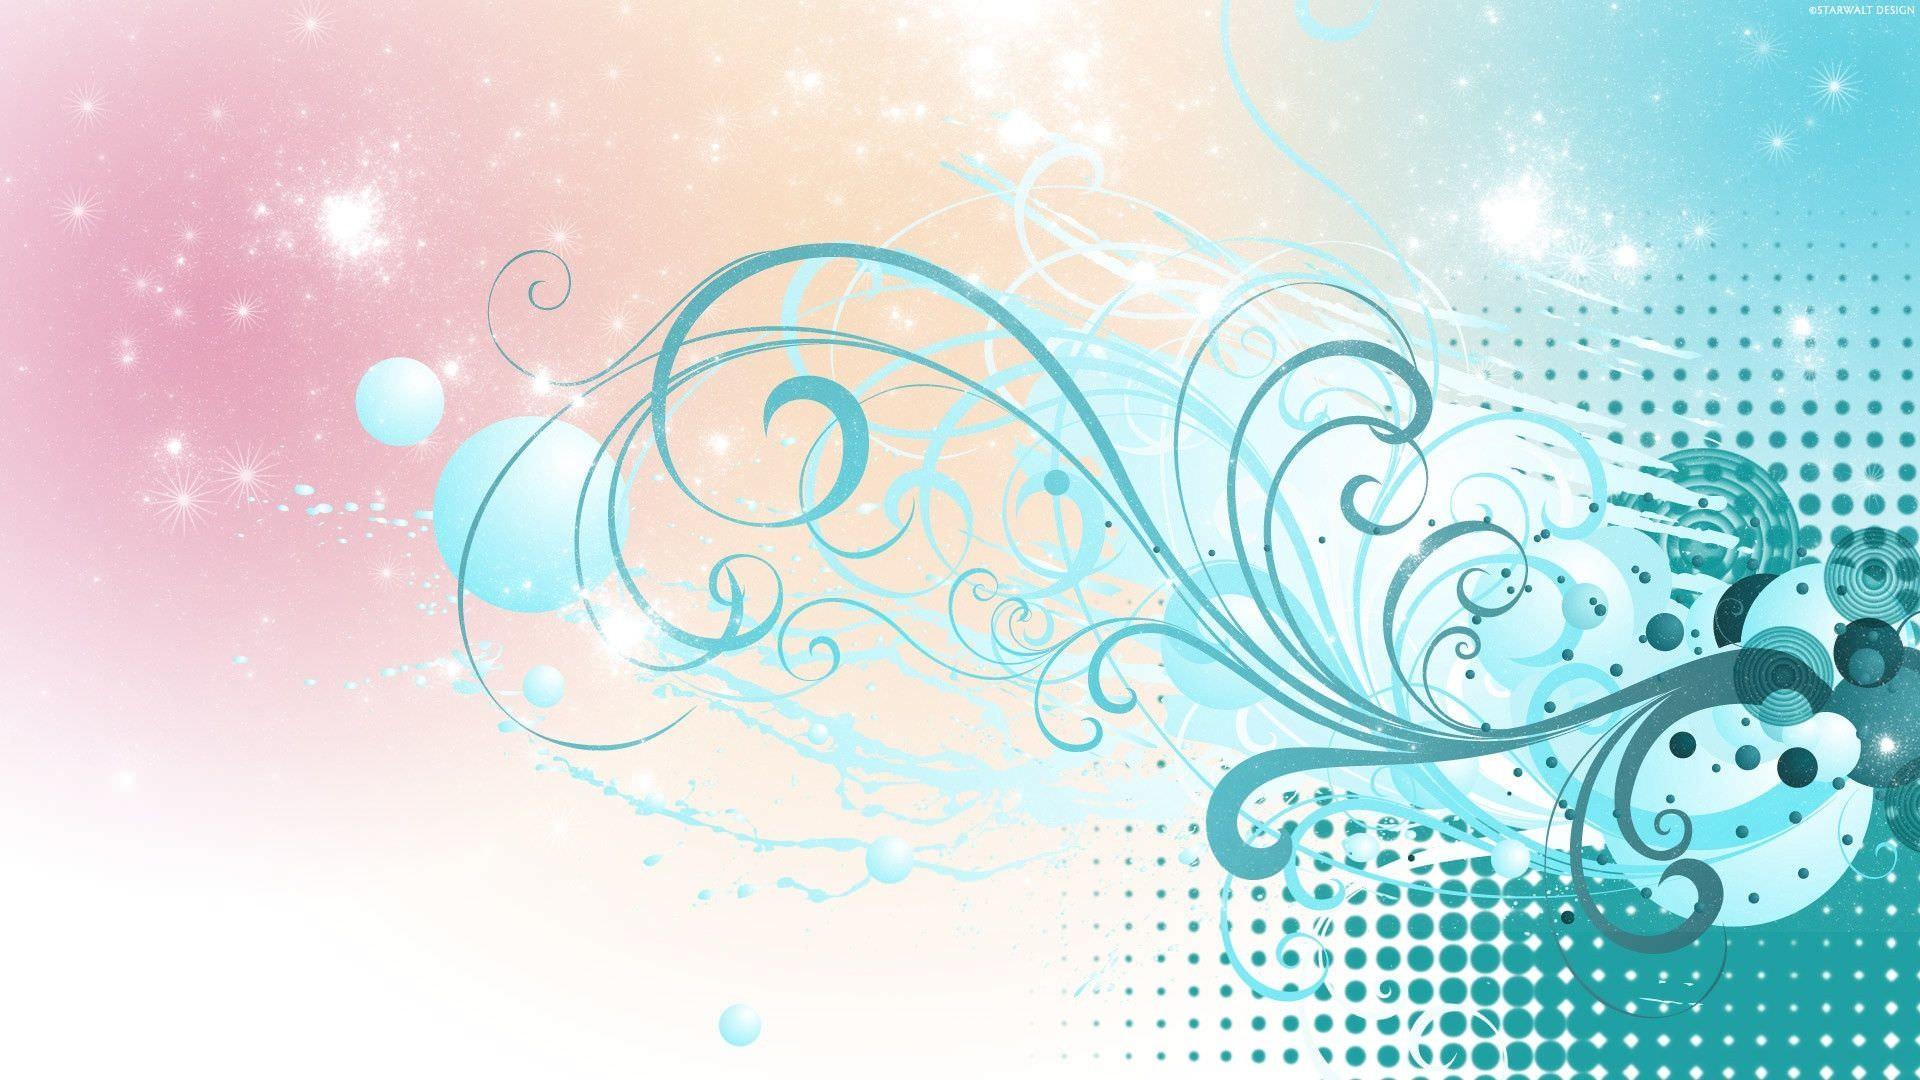 Elegant Wallpapers, good mood Wallpapers, Girls, Art Wallpapers .